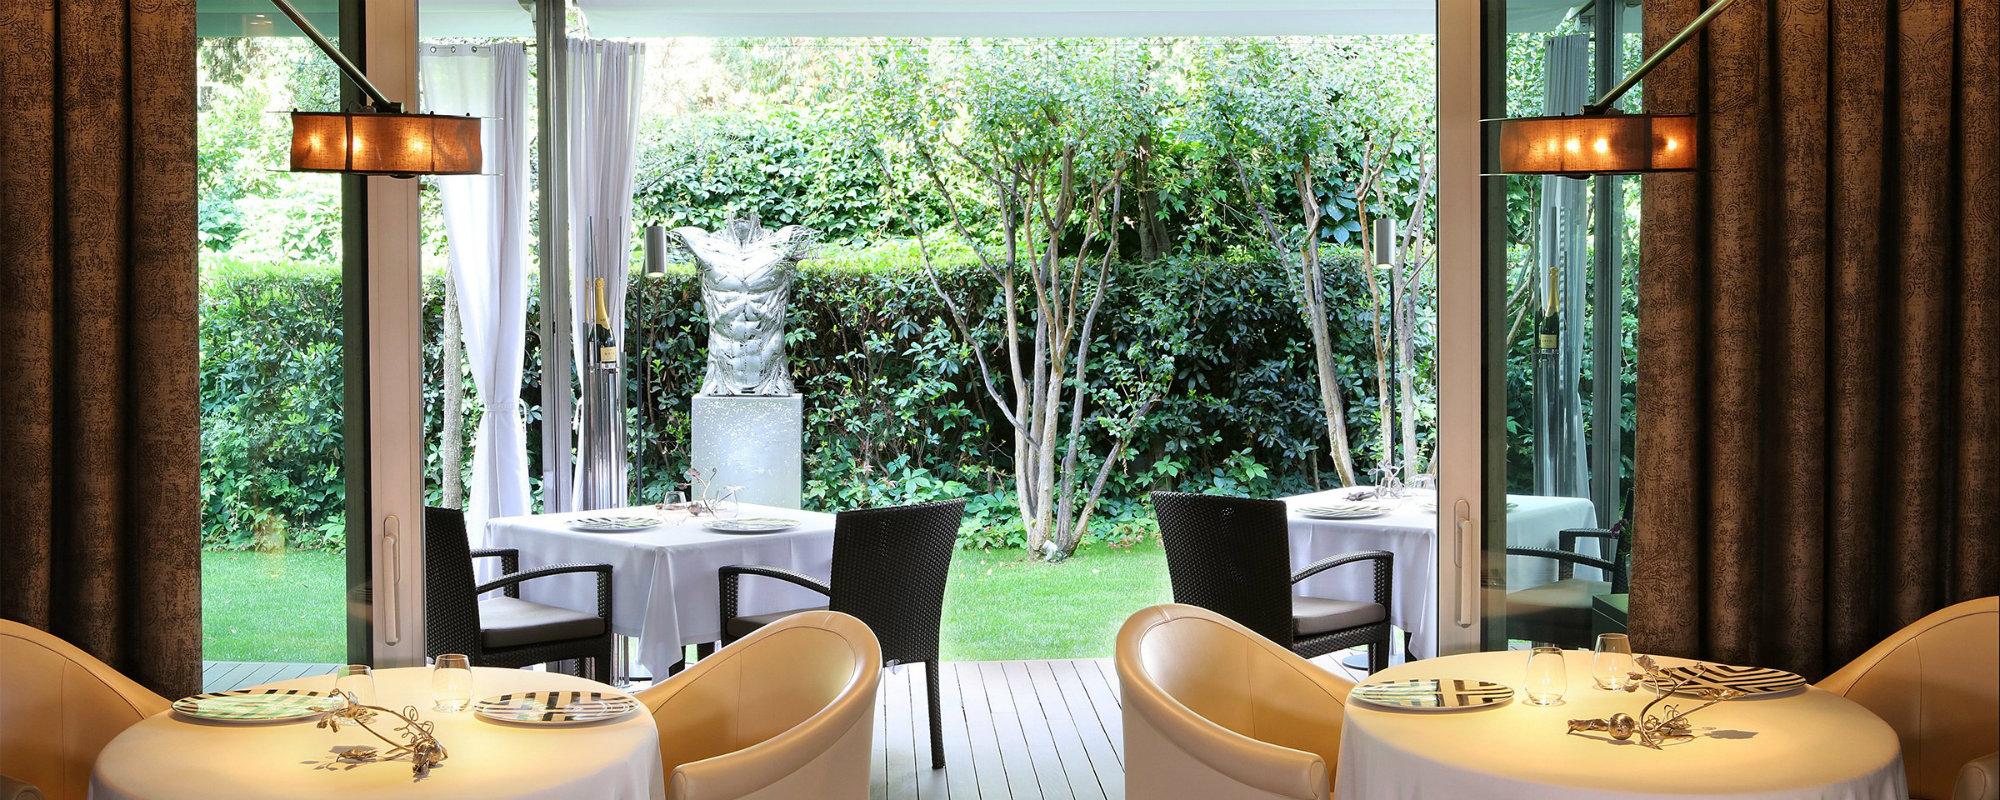 ABaC – Restaurante de Lujo en Barcelona Restaurante de Lujo ABaC: Restaurante de Lujo en Barcelona Featured 2